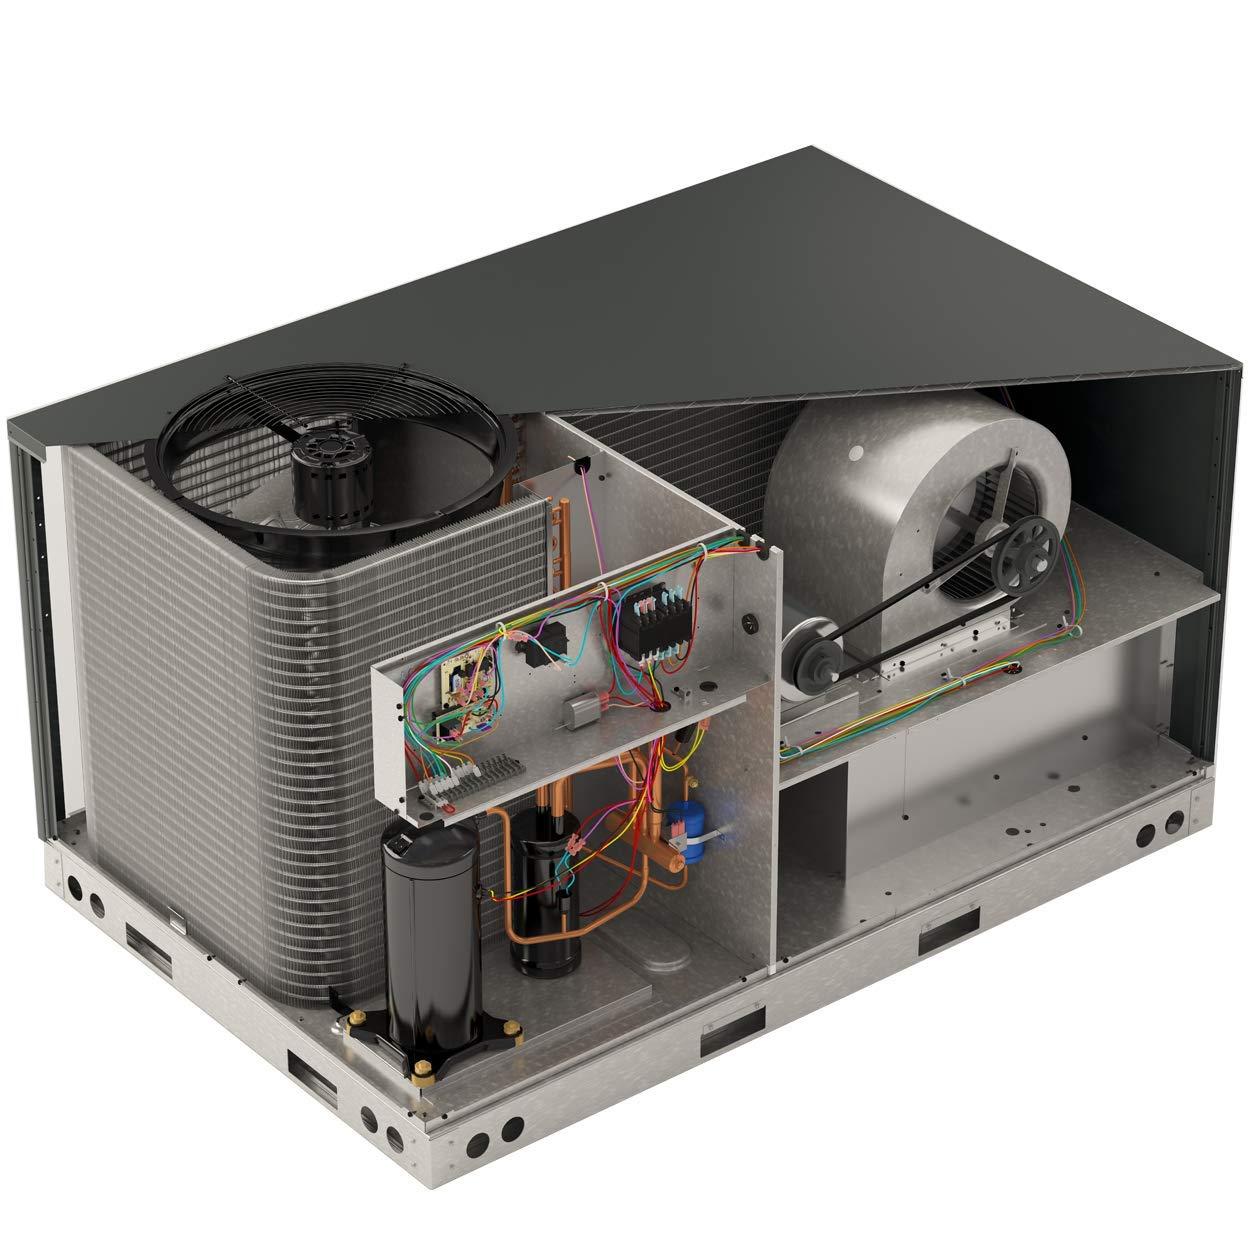 Low NOX 17.5 Width 1,200 CFM Goodman GMVC960603BN Variable Speed 2-Stage UPFLOW//Horizontal Gas Furnace 96/% AFUE 60,000 BTU//H